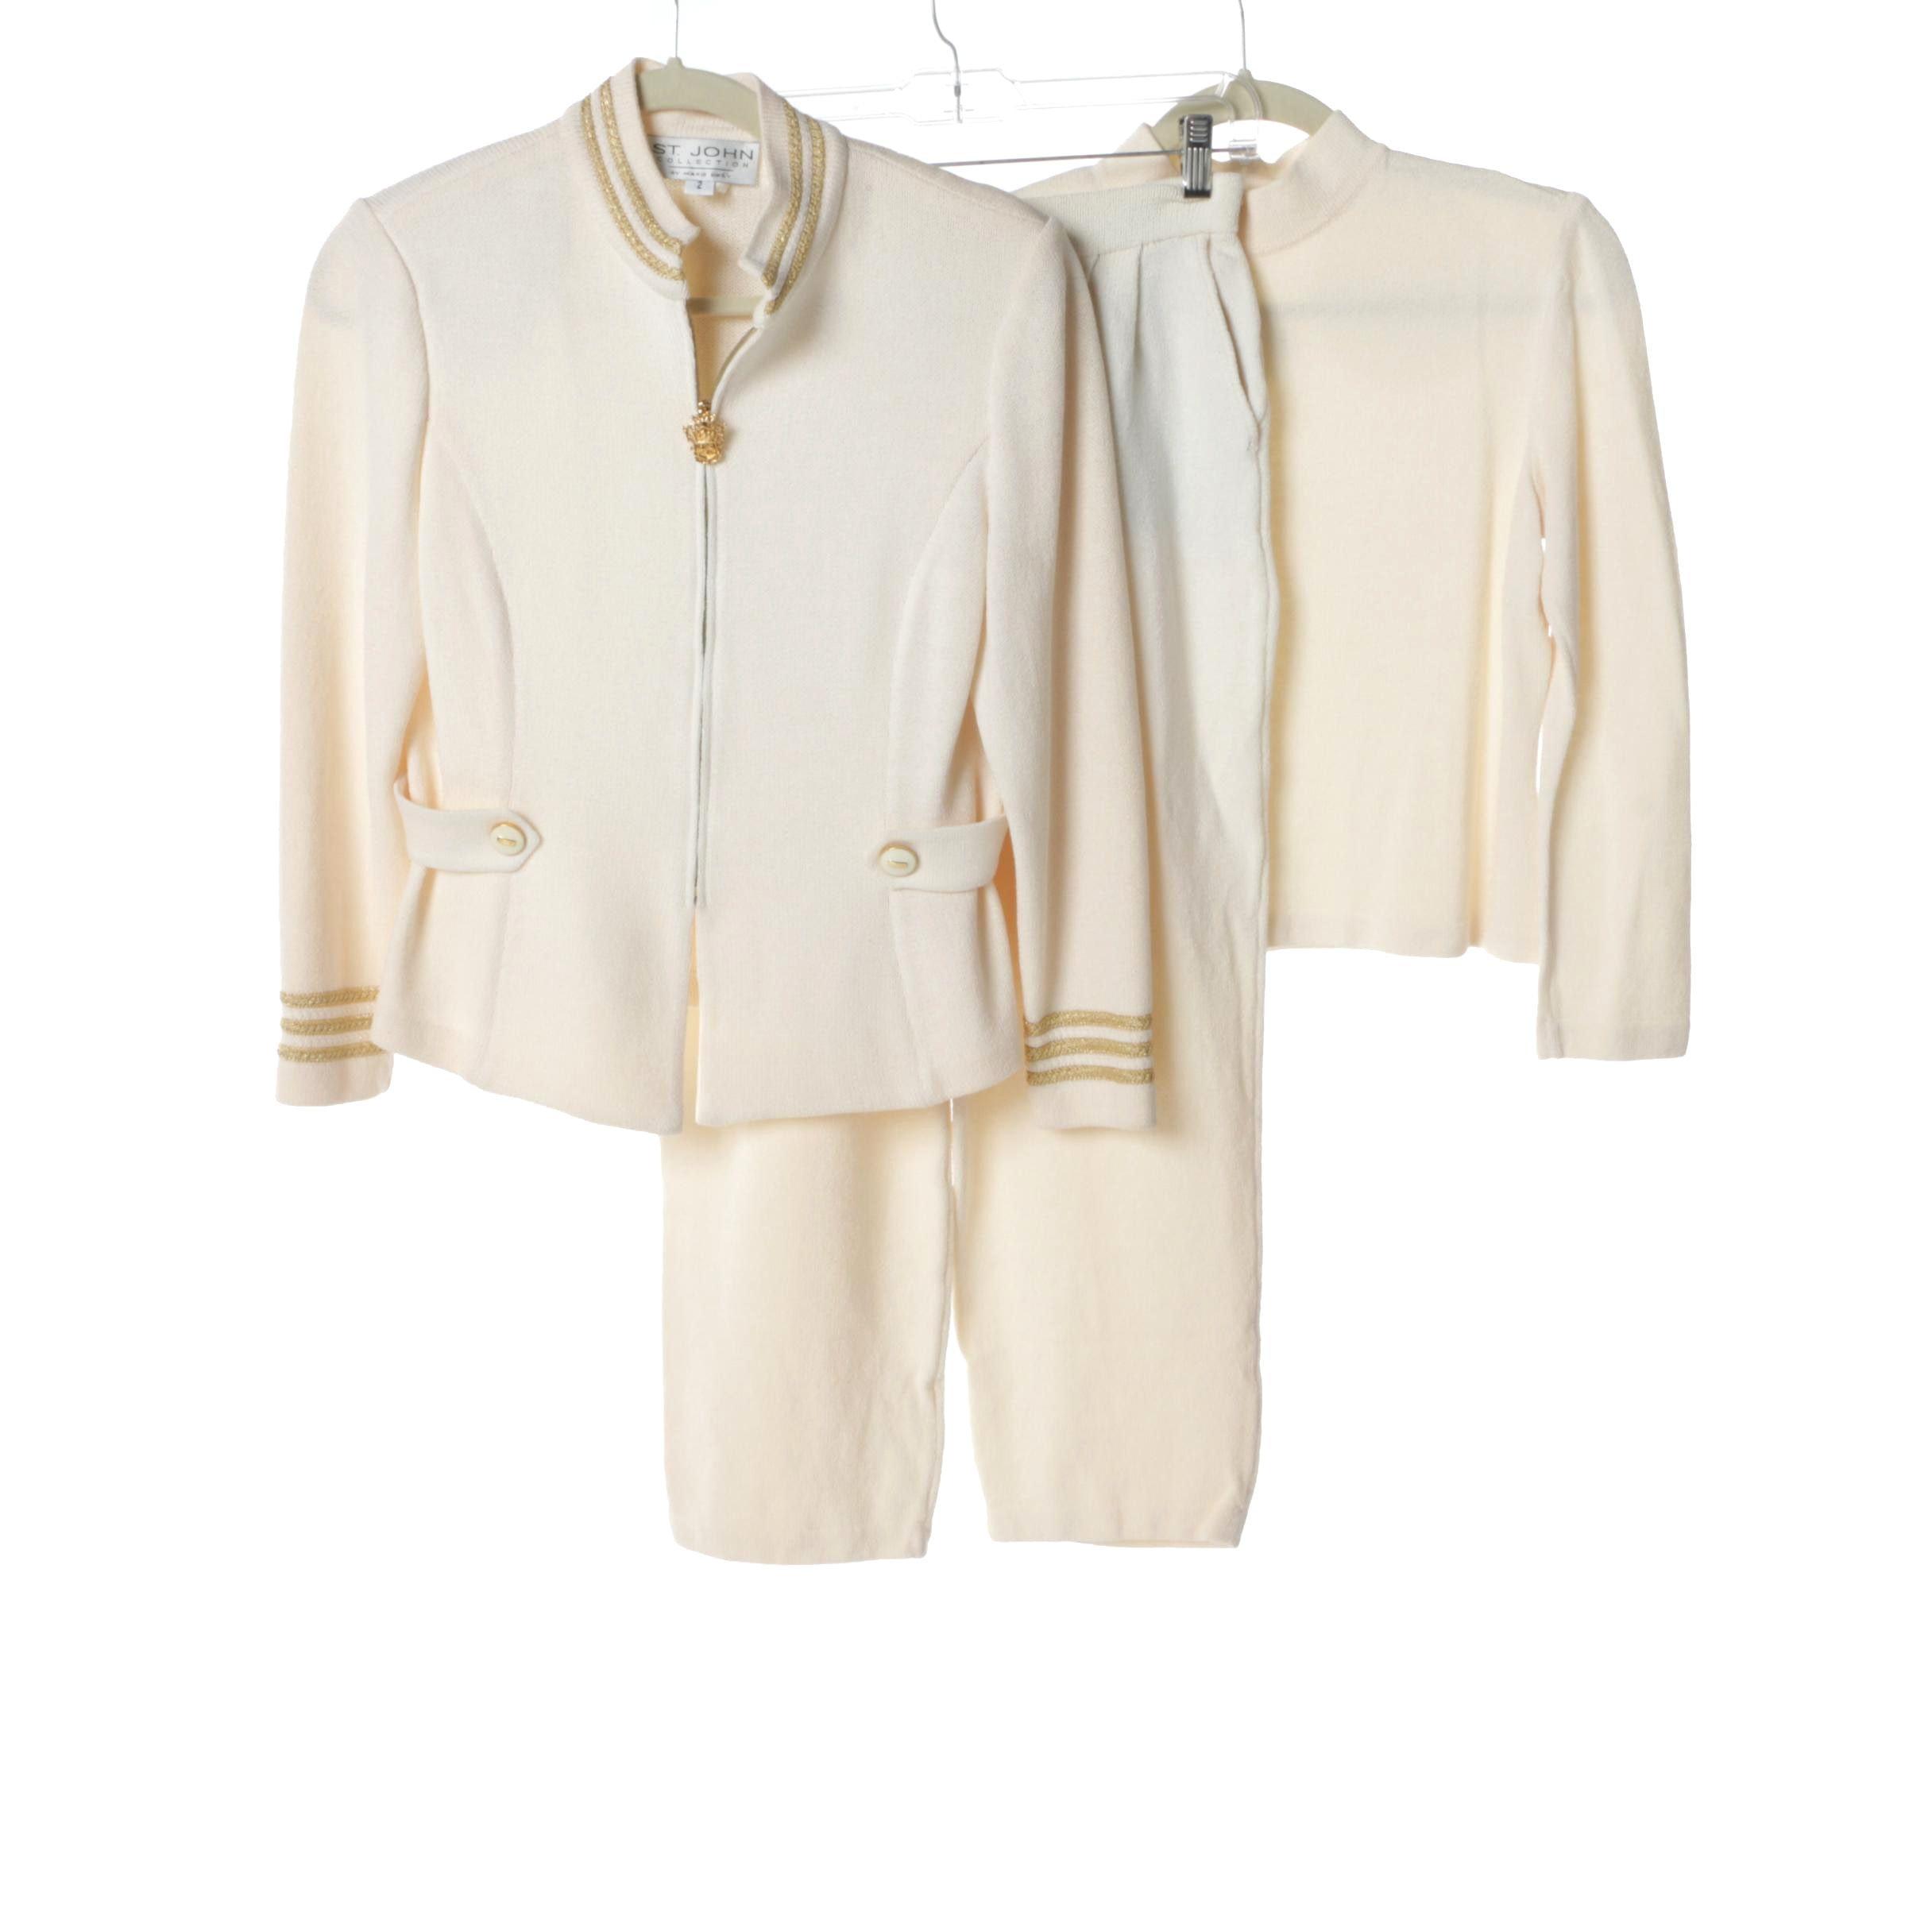 Women's St. John Collection Cream Knit Pantsuit and Turtleneck